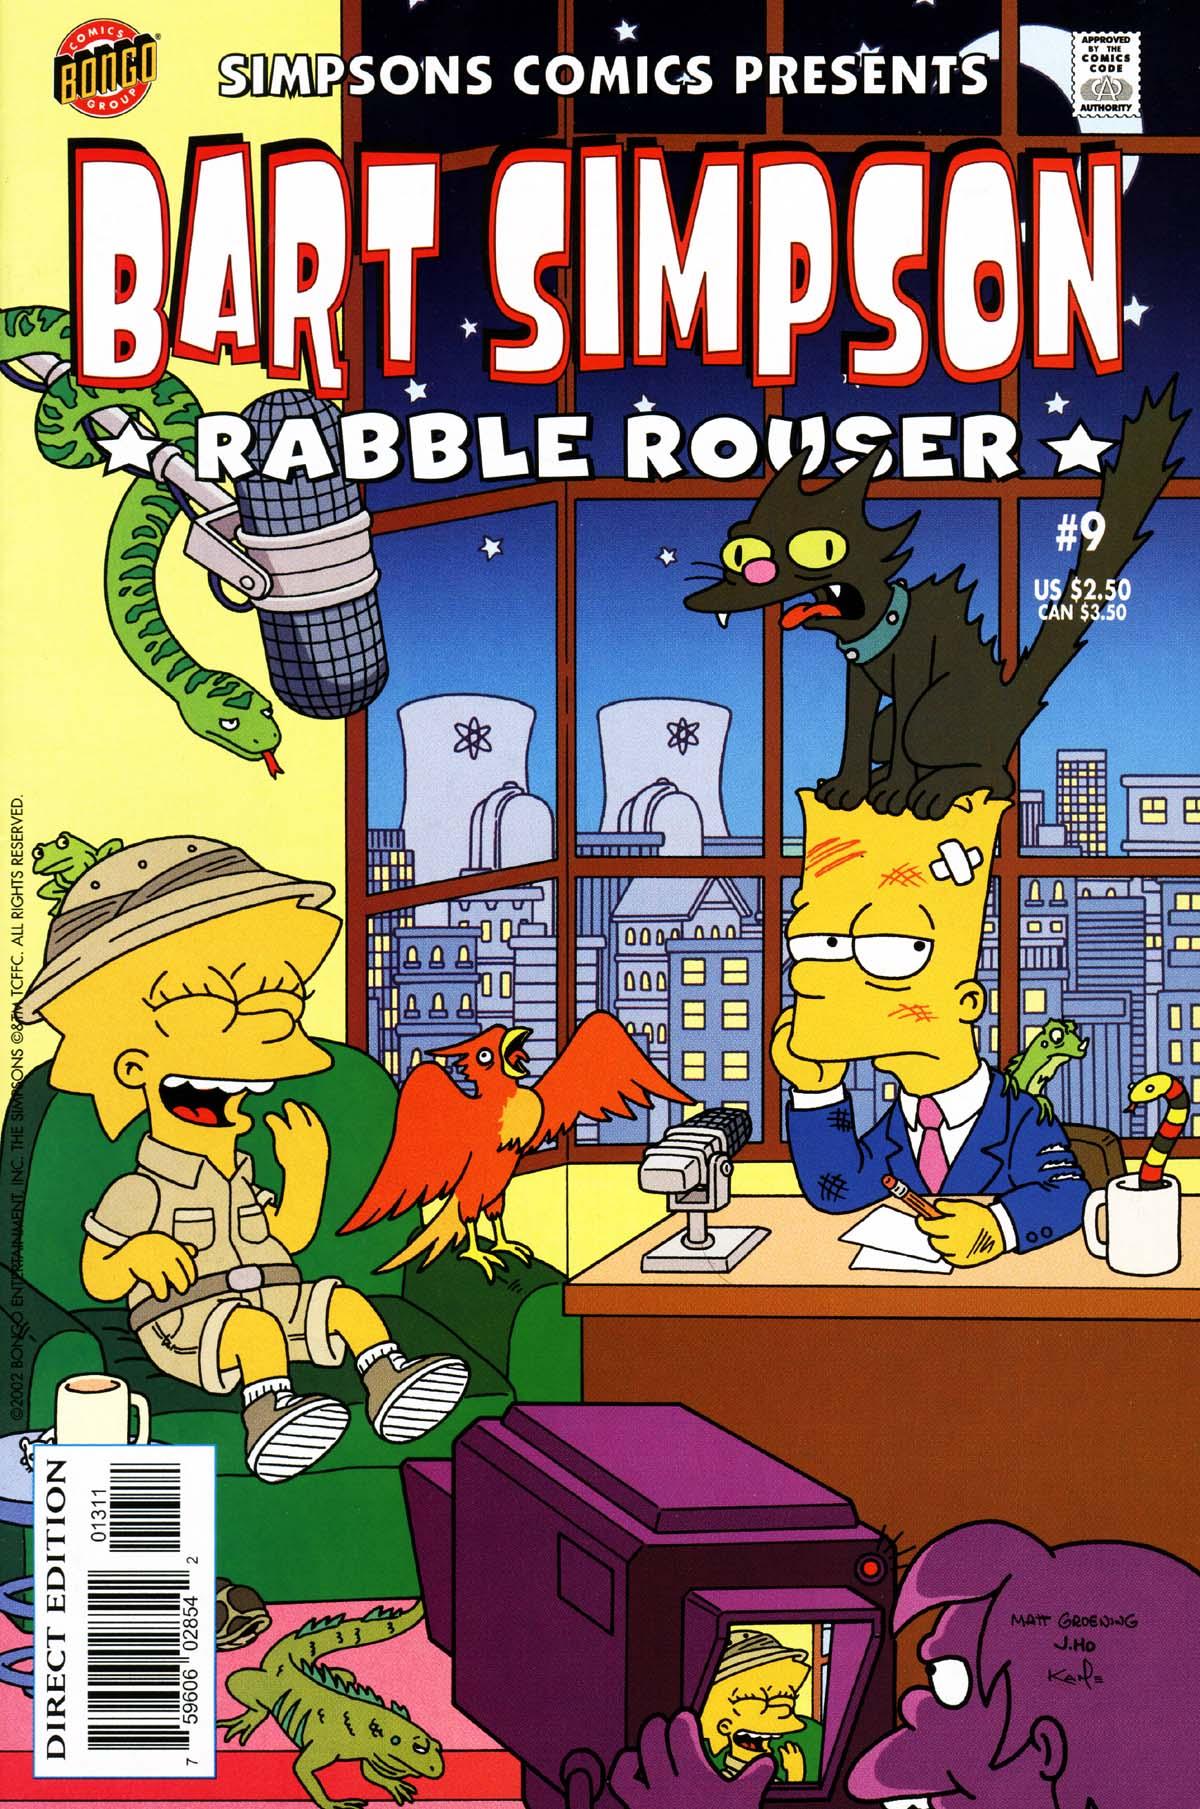 Read online Simpsons Comics Presents Bart Simpson comic -  Issue #9 - 1